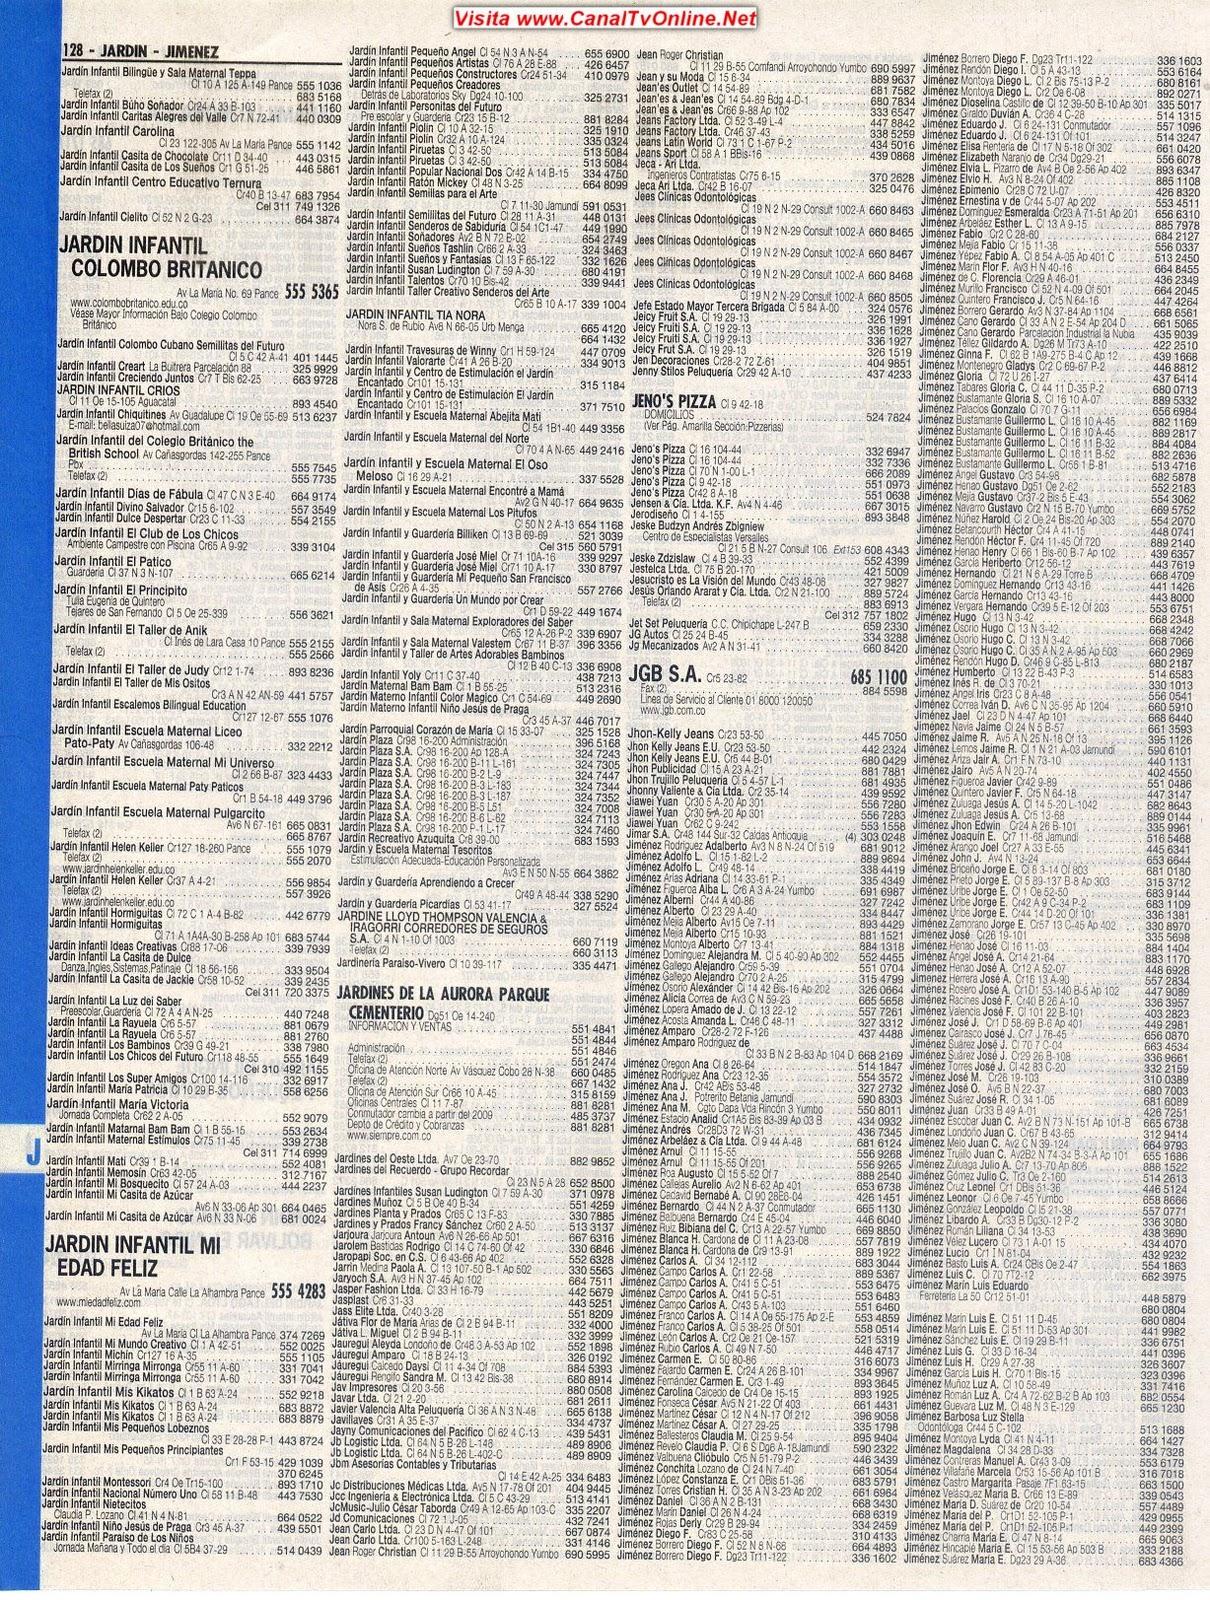 Washington DC Hostel Listings - All Hostels in Washington